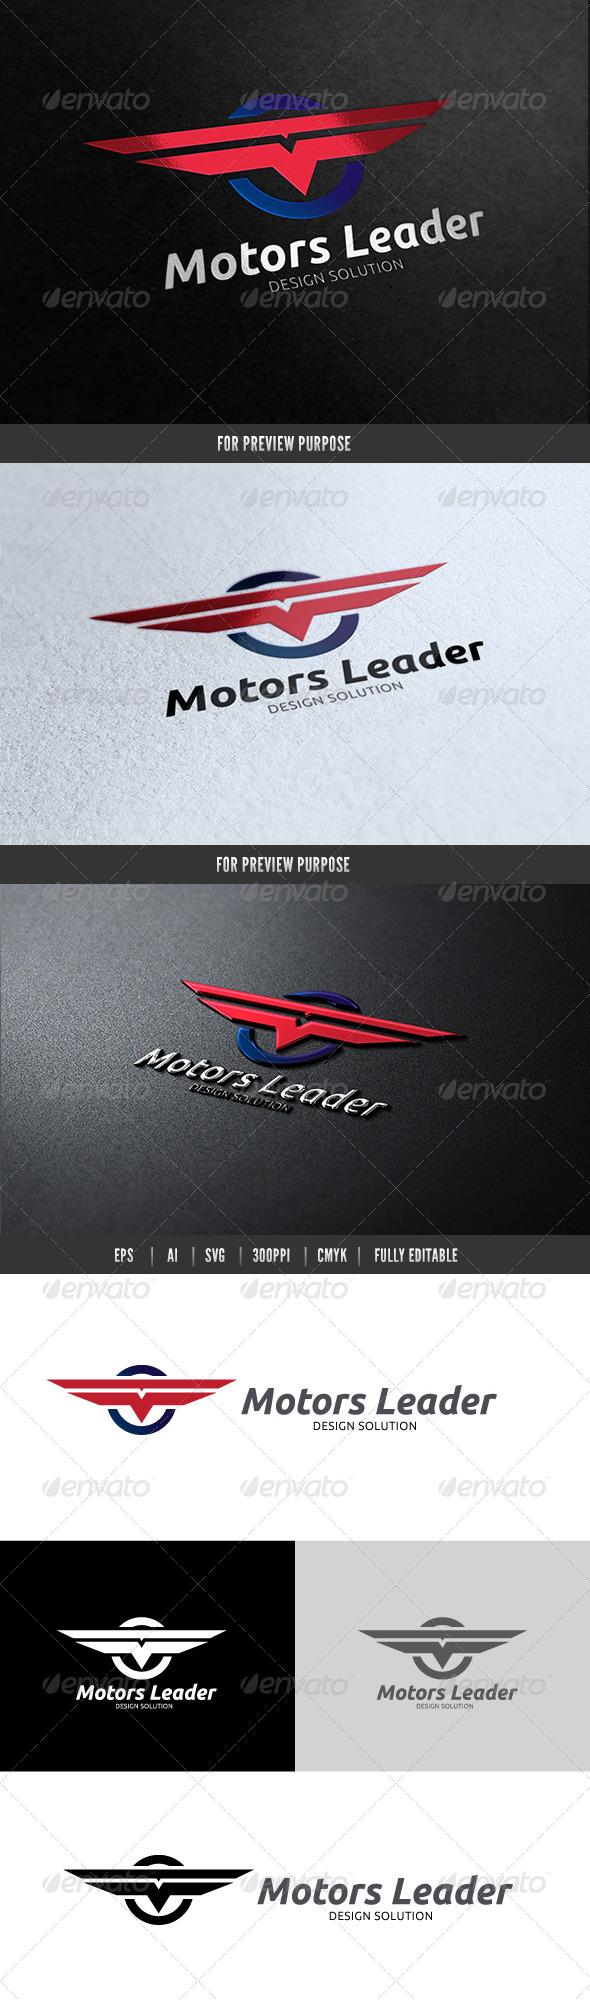 GraphicRiver Motors Leader 6481416